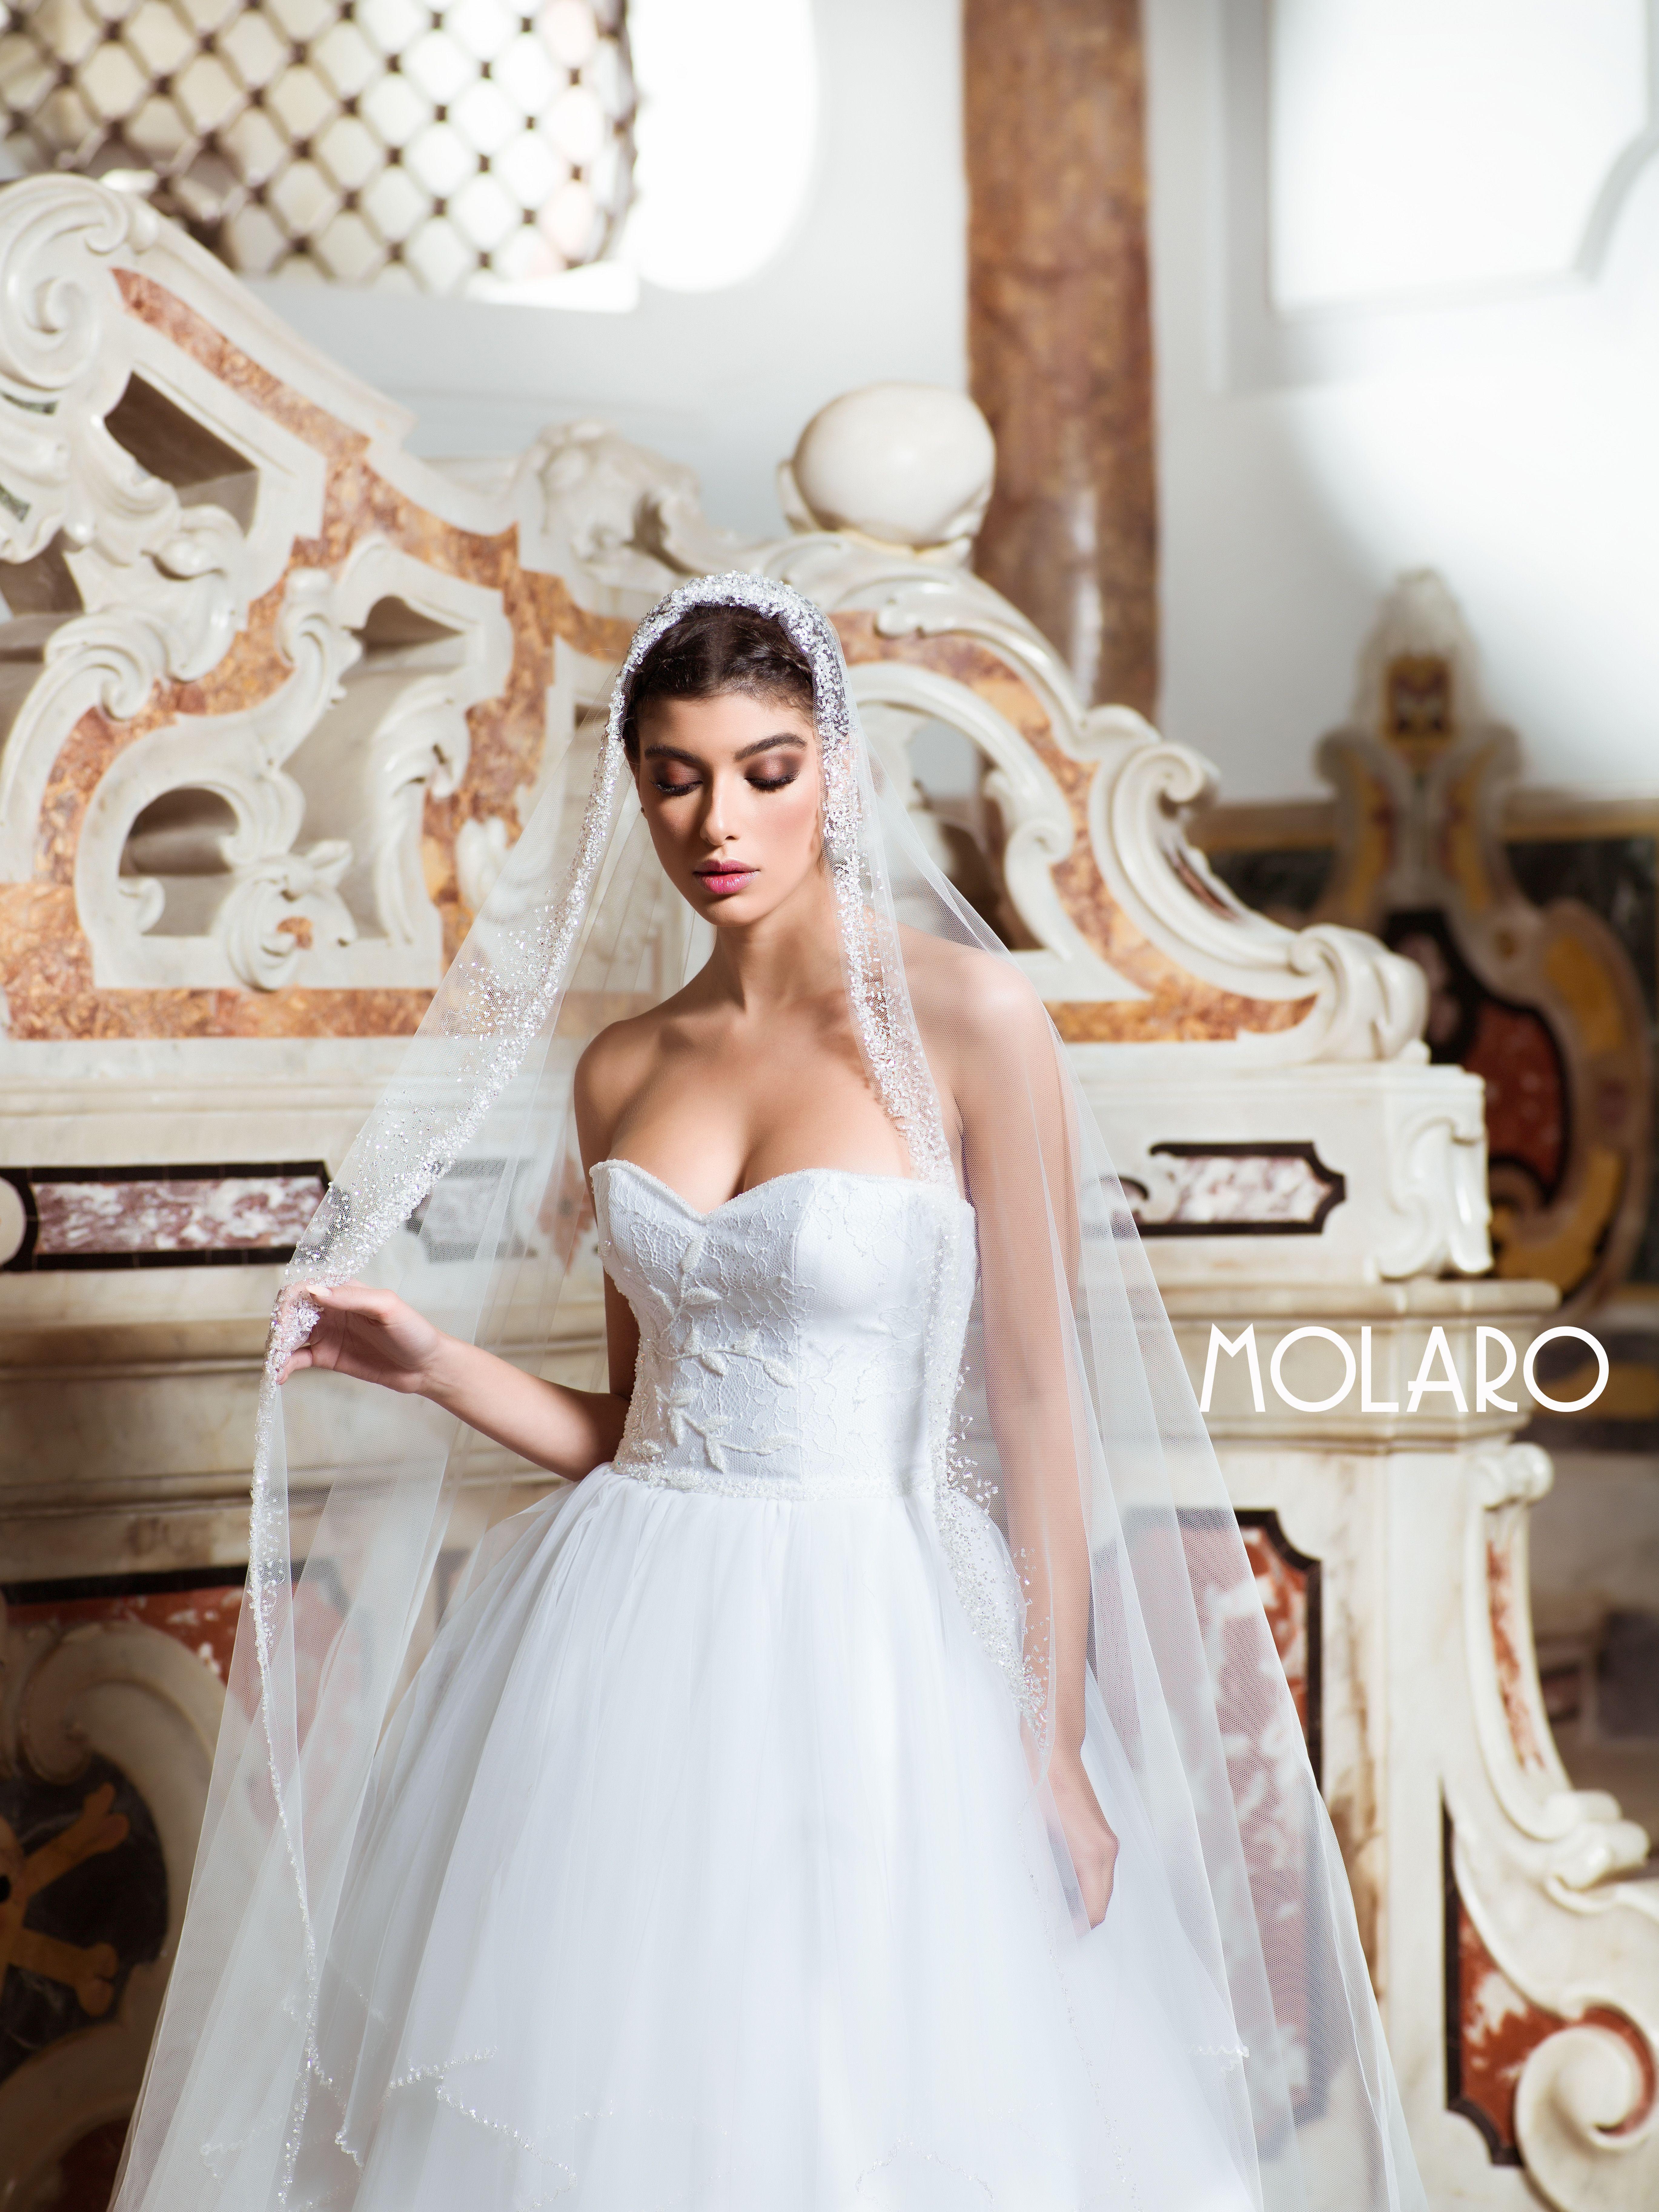 Gianni Molaro Sposa Velo Abitodasposa Weddingdress Style Nozze Abito Da Sposa Senza Spalline Abiti Da Sposa Vestiti